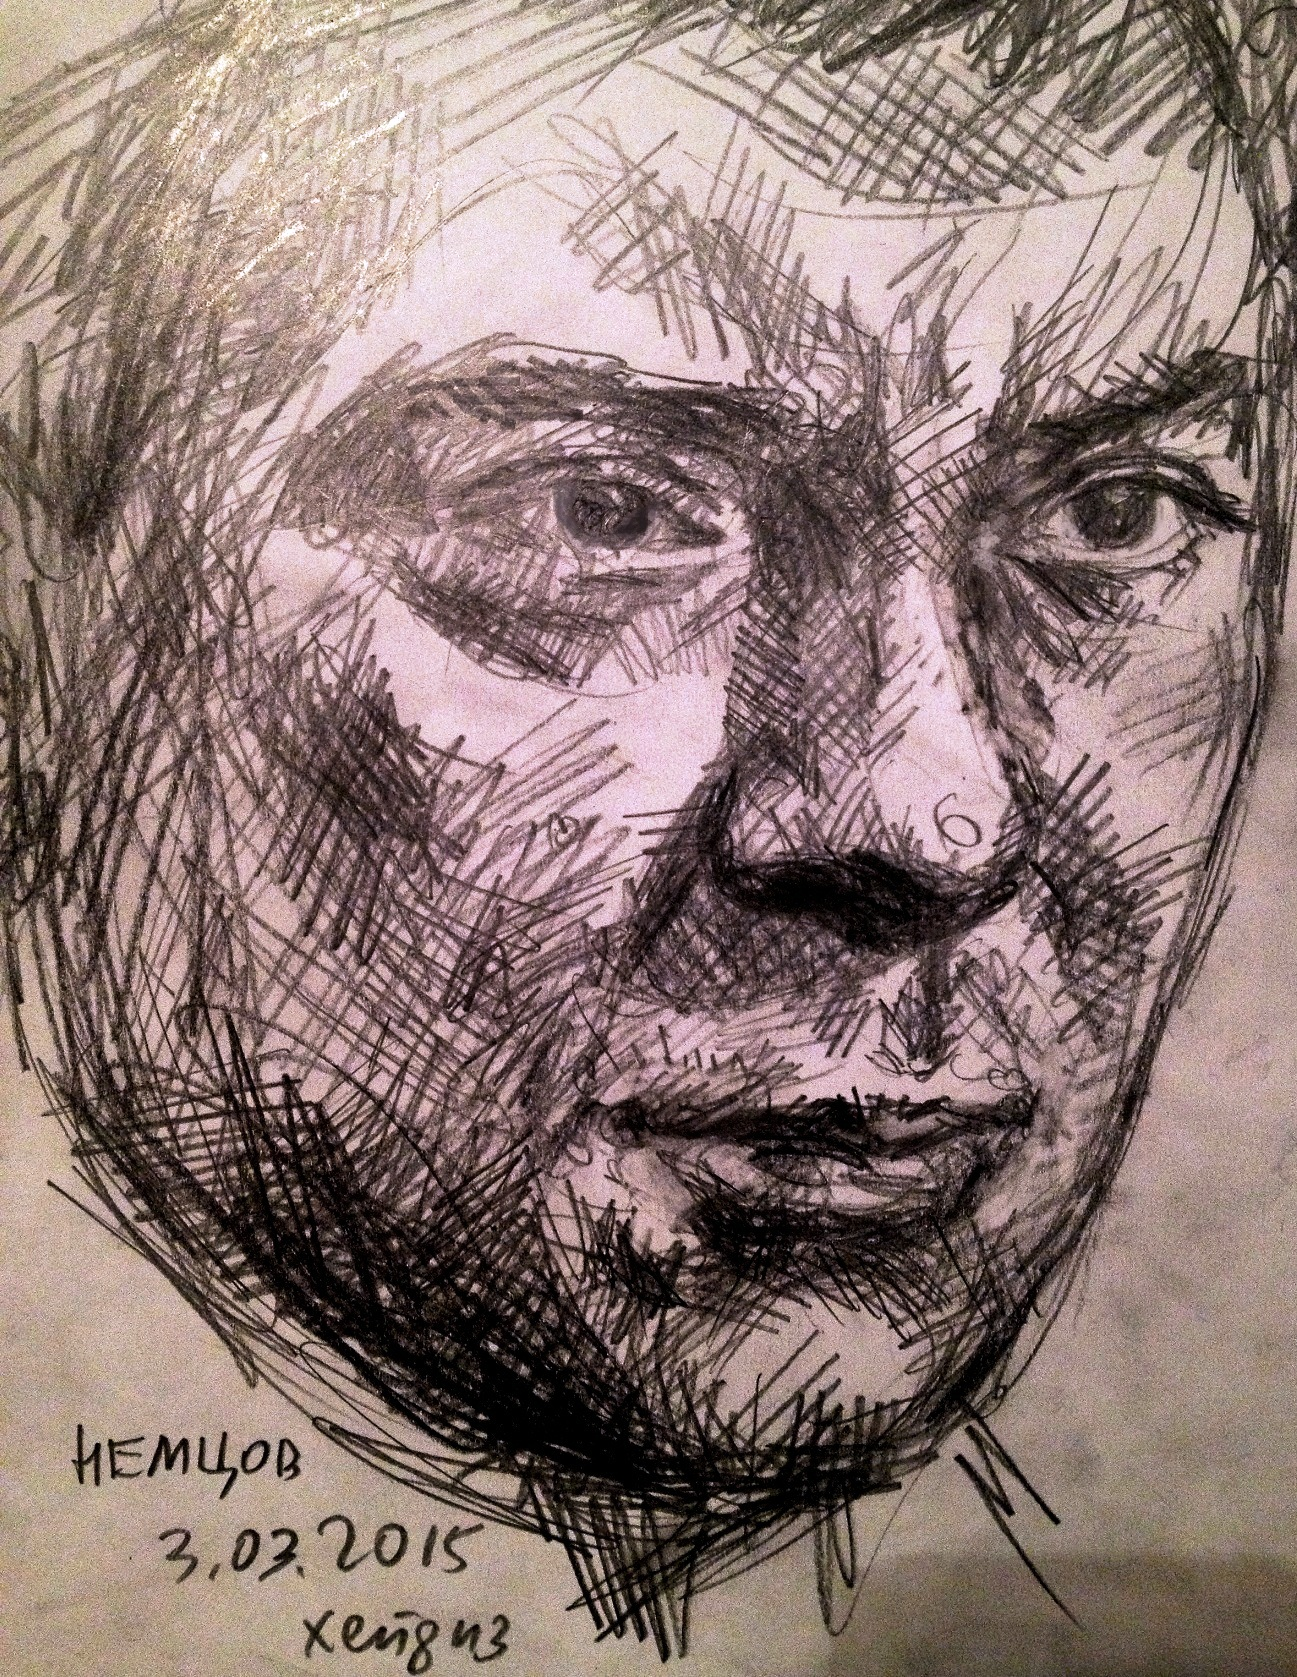 bn4.jpBoris Nemtsovg